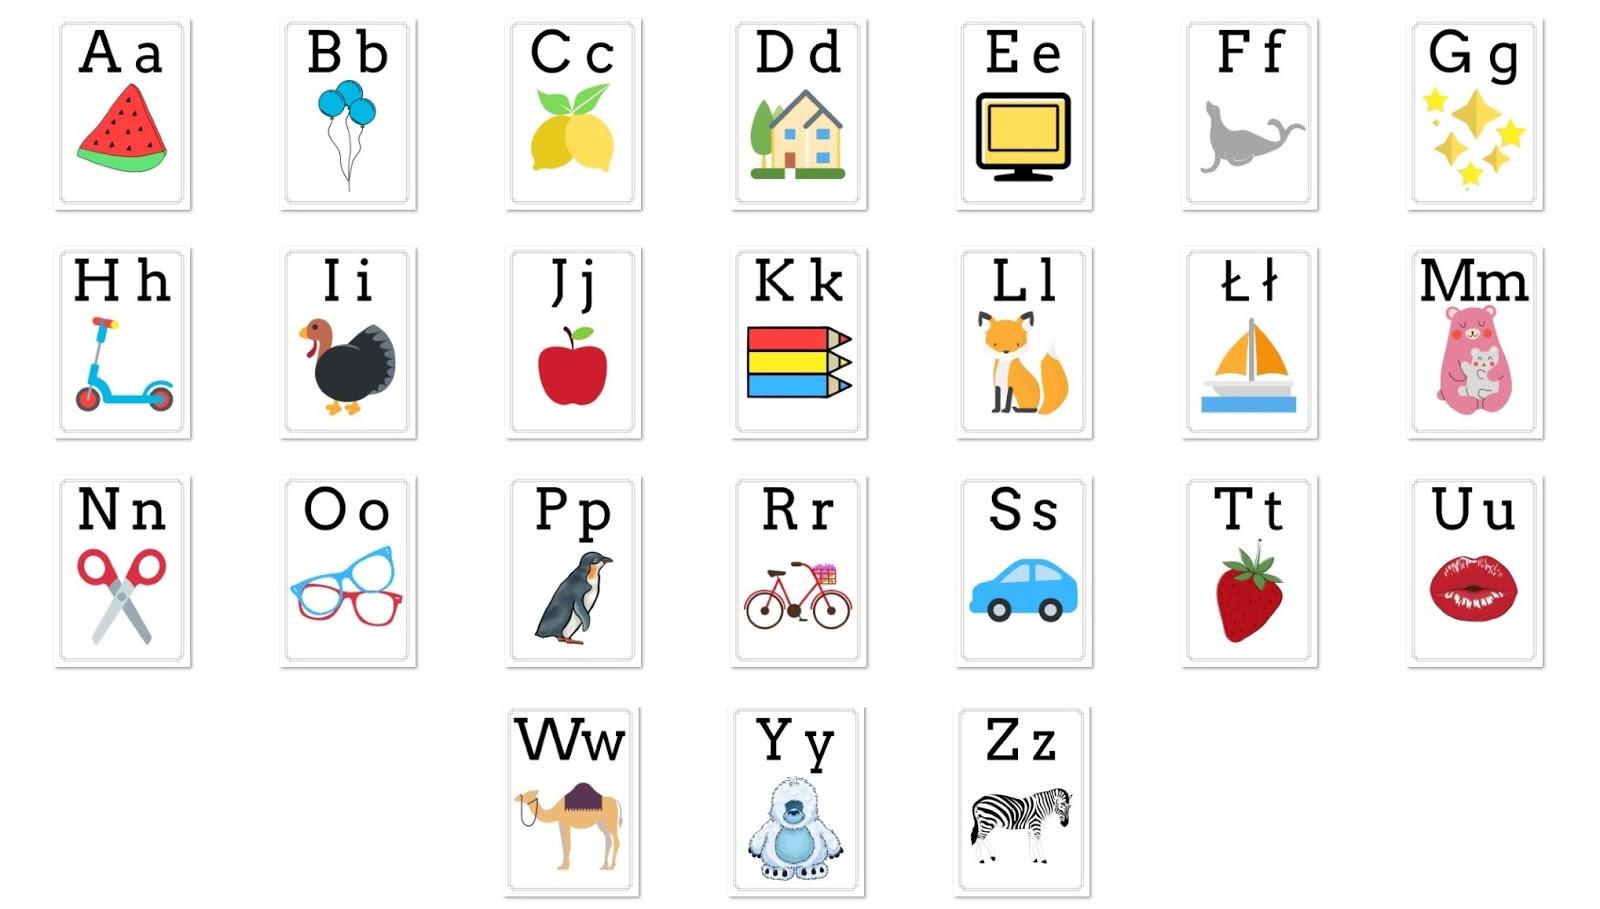 karty z alfabetem